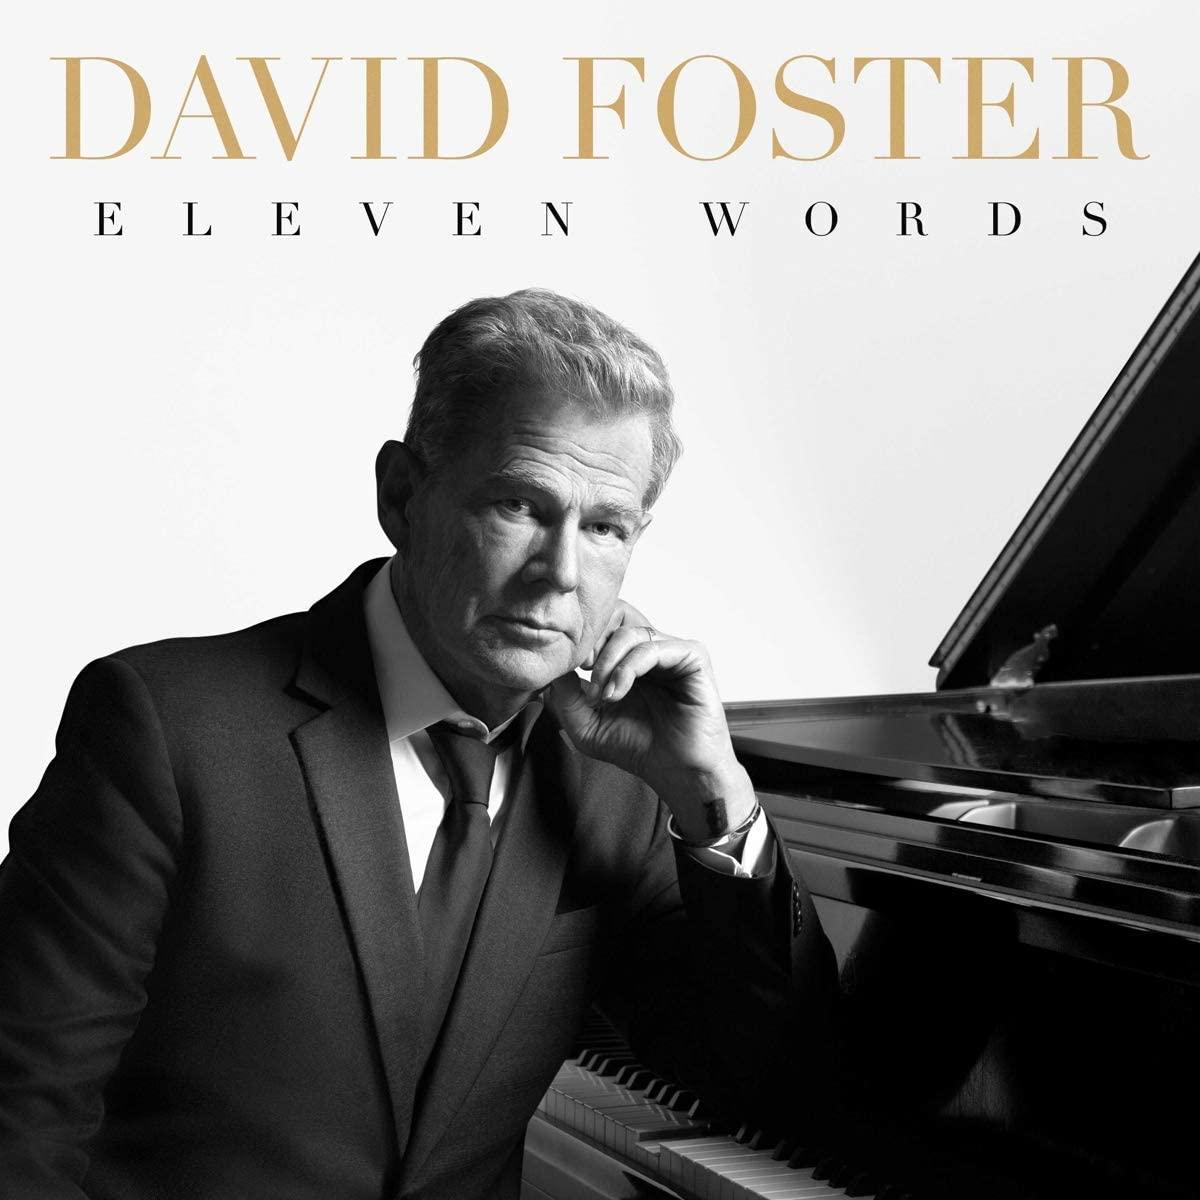 david foster_11 words